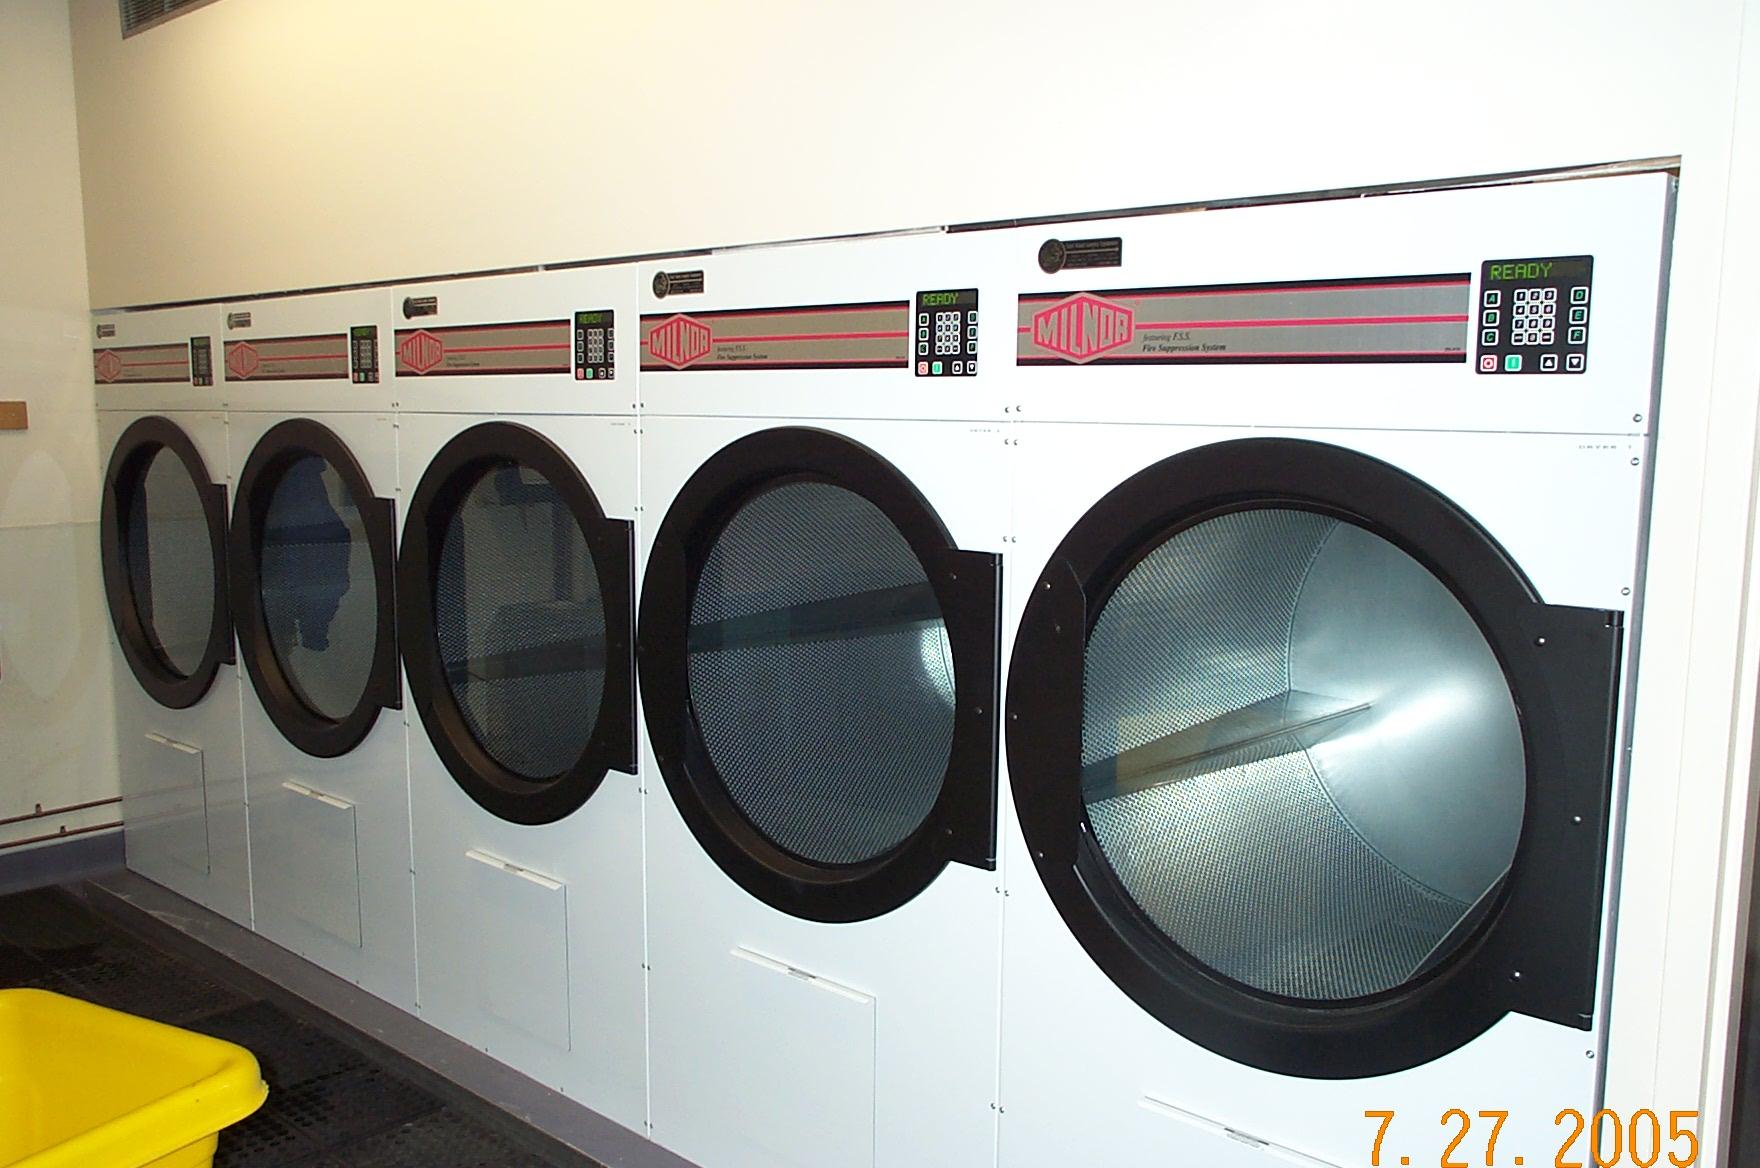 Northwood Halifax - Milnor Dryers.JPG